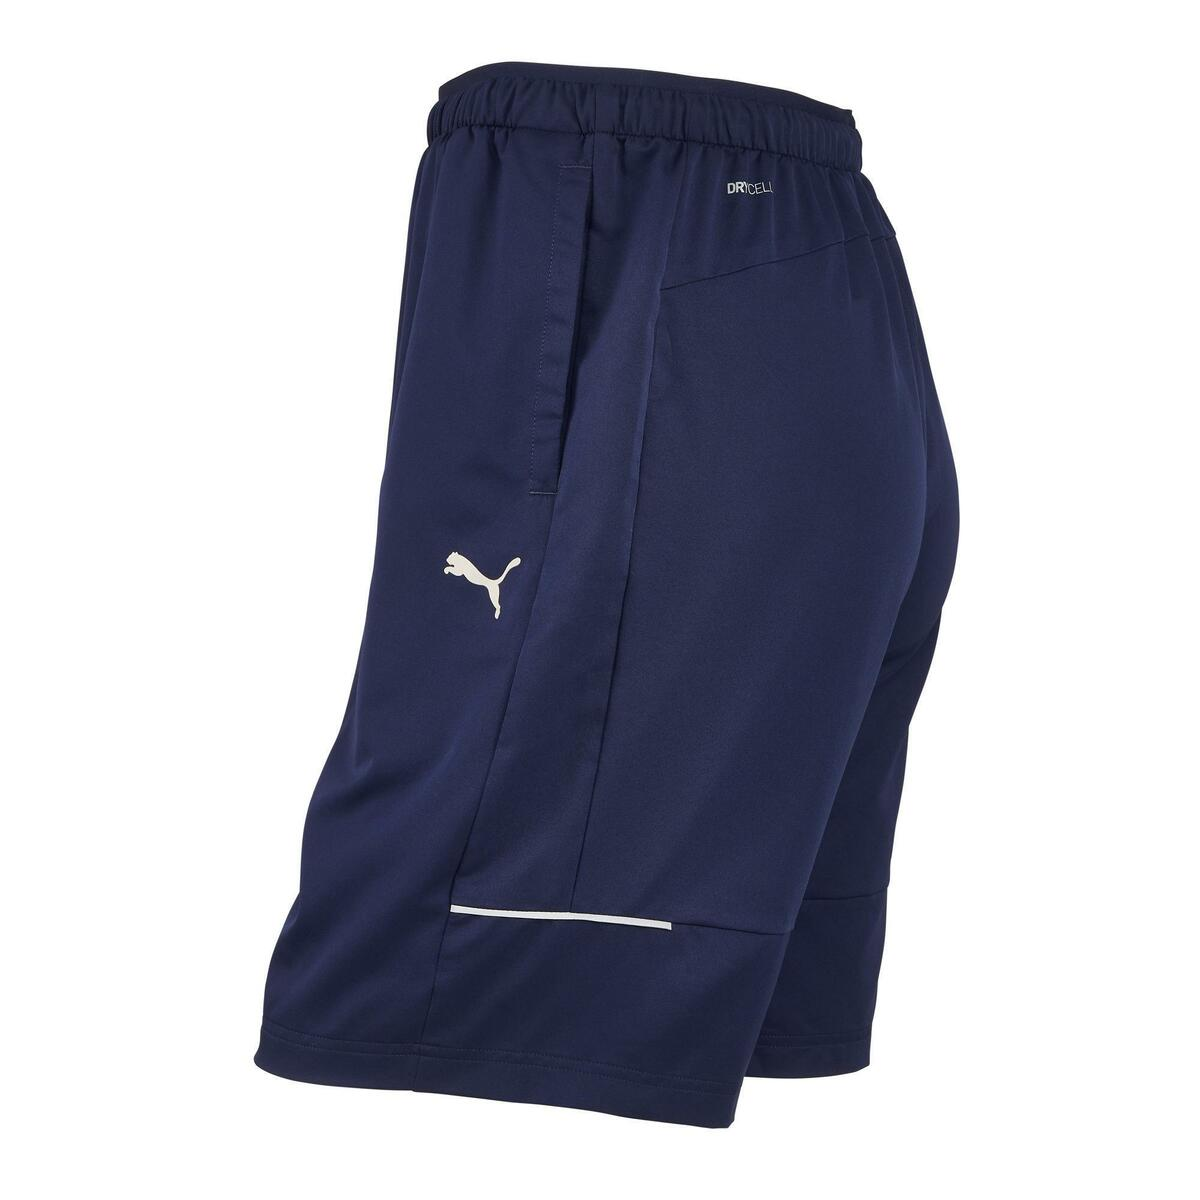 Bild 4 von Sporthose kurz Fitness Herren blau